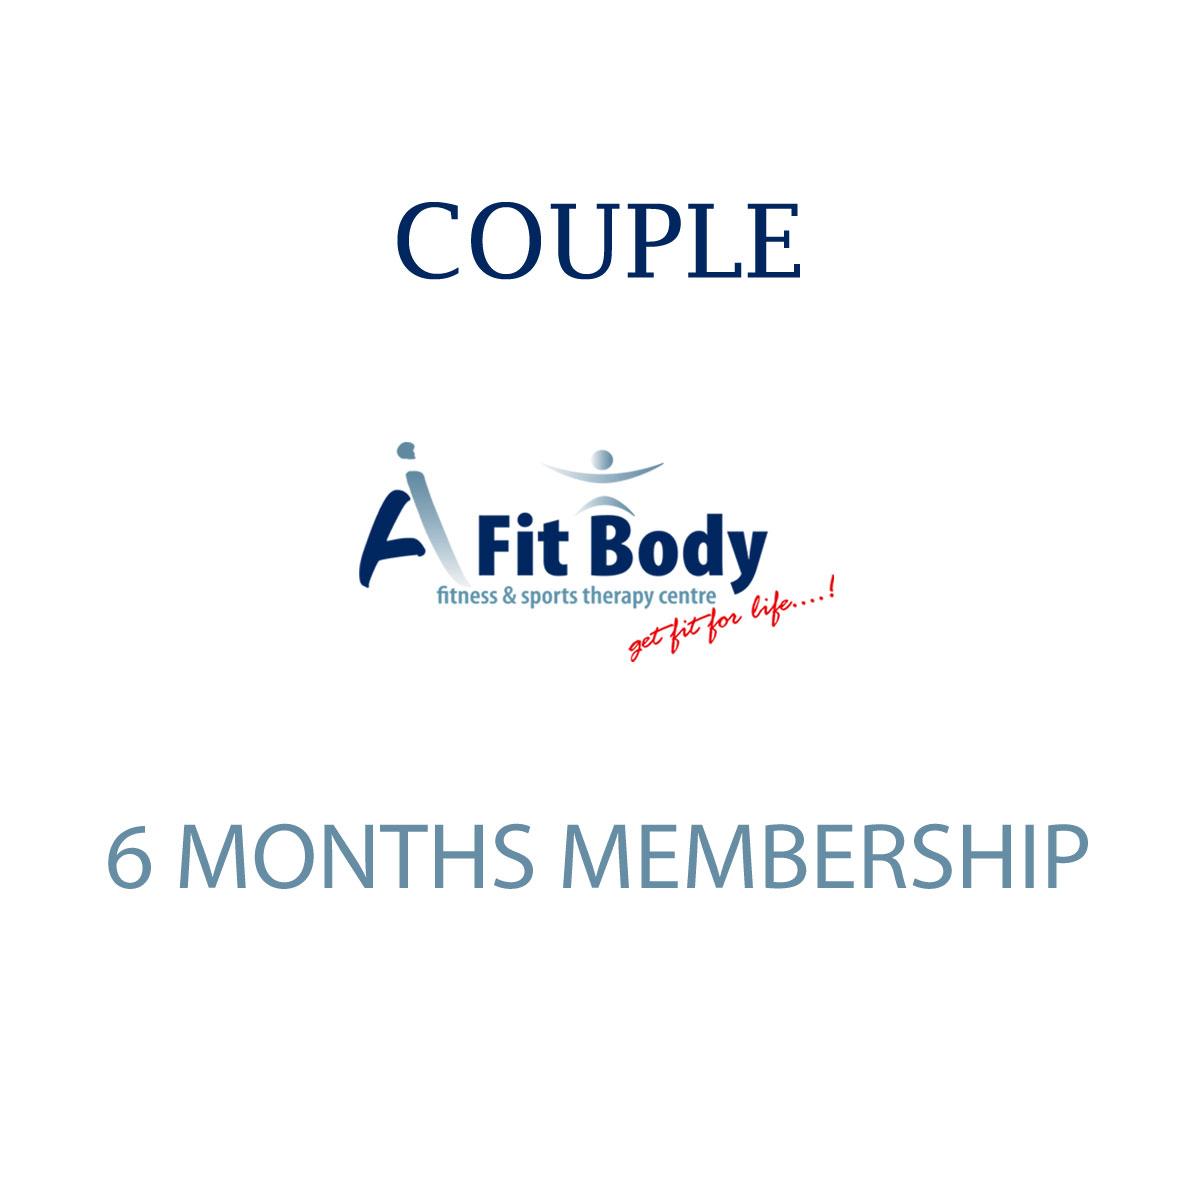 Couple - 6 Months Membership